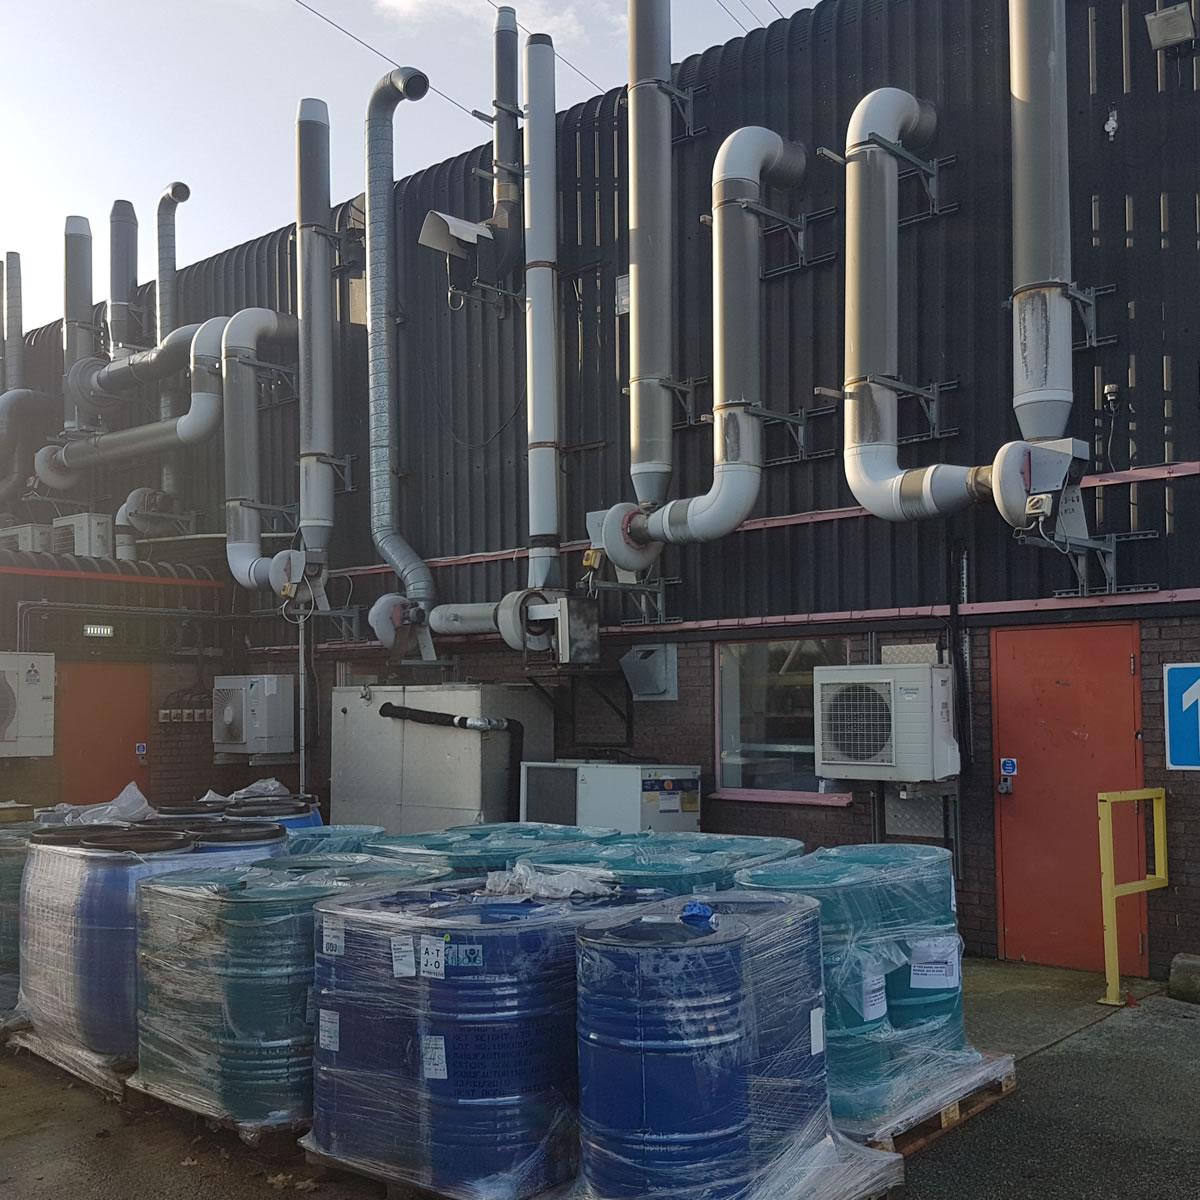 carbon sensor facility north wales